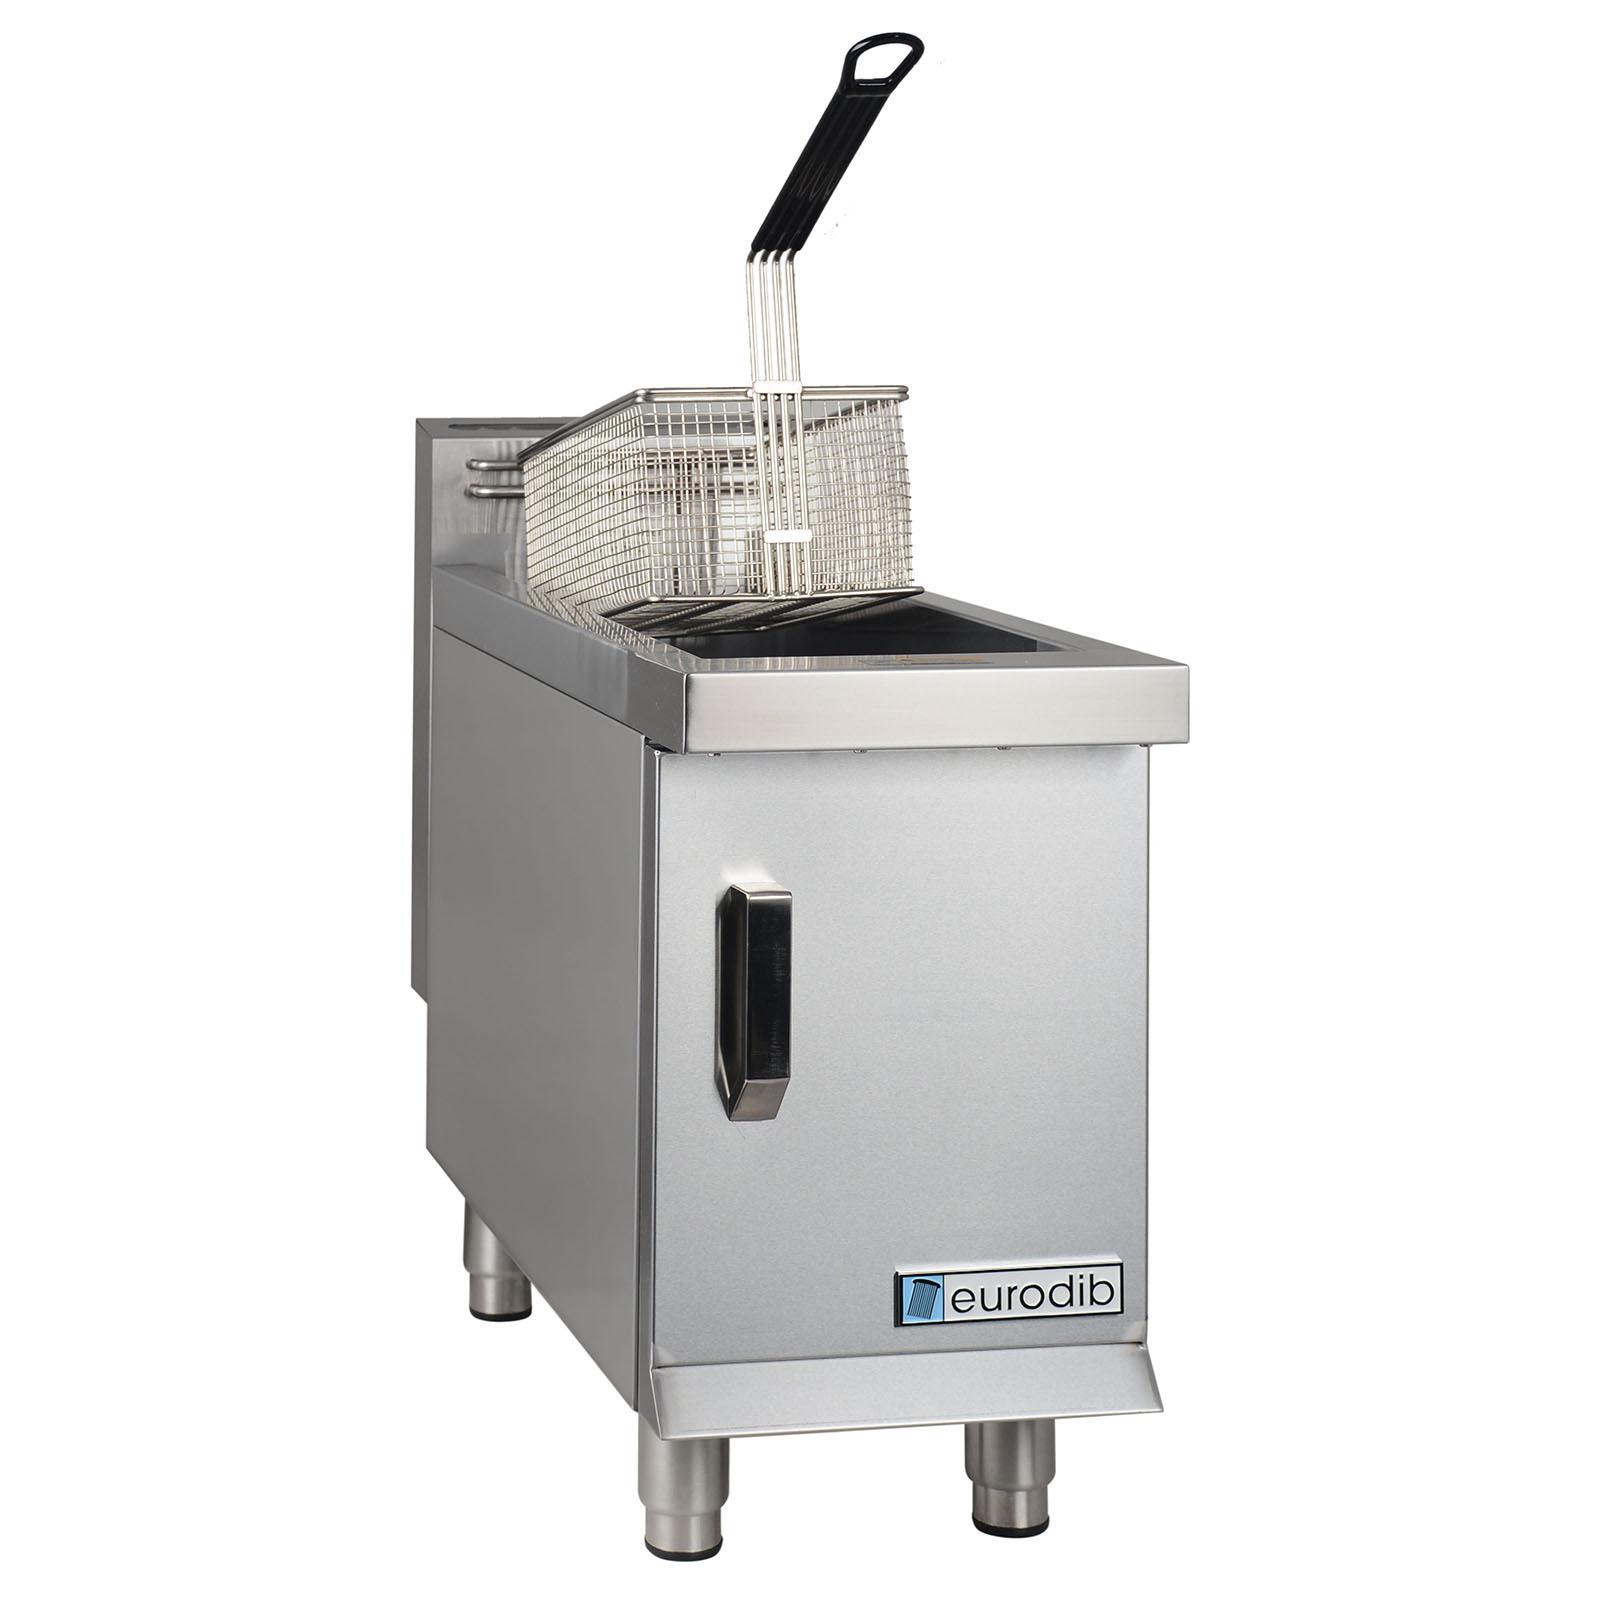 Eurodib USA T-CF15 fryer, gas, countertop, full pot